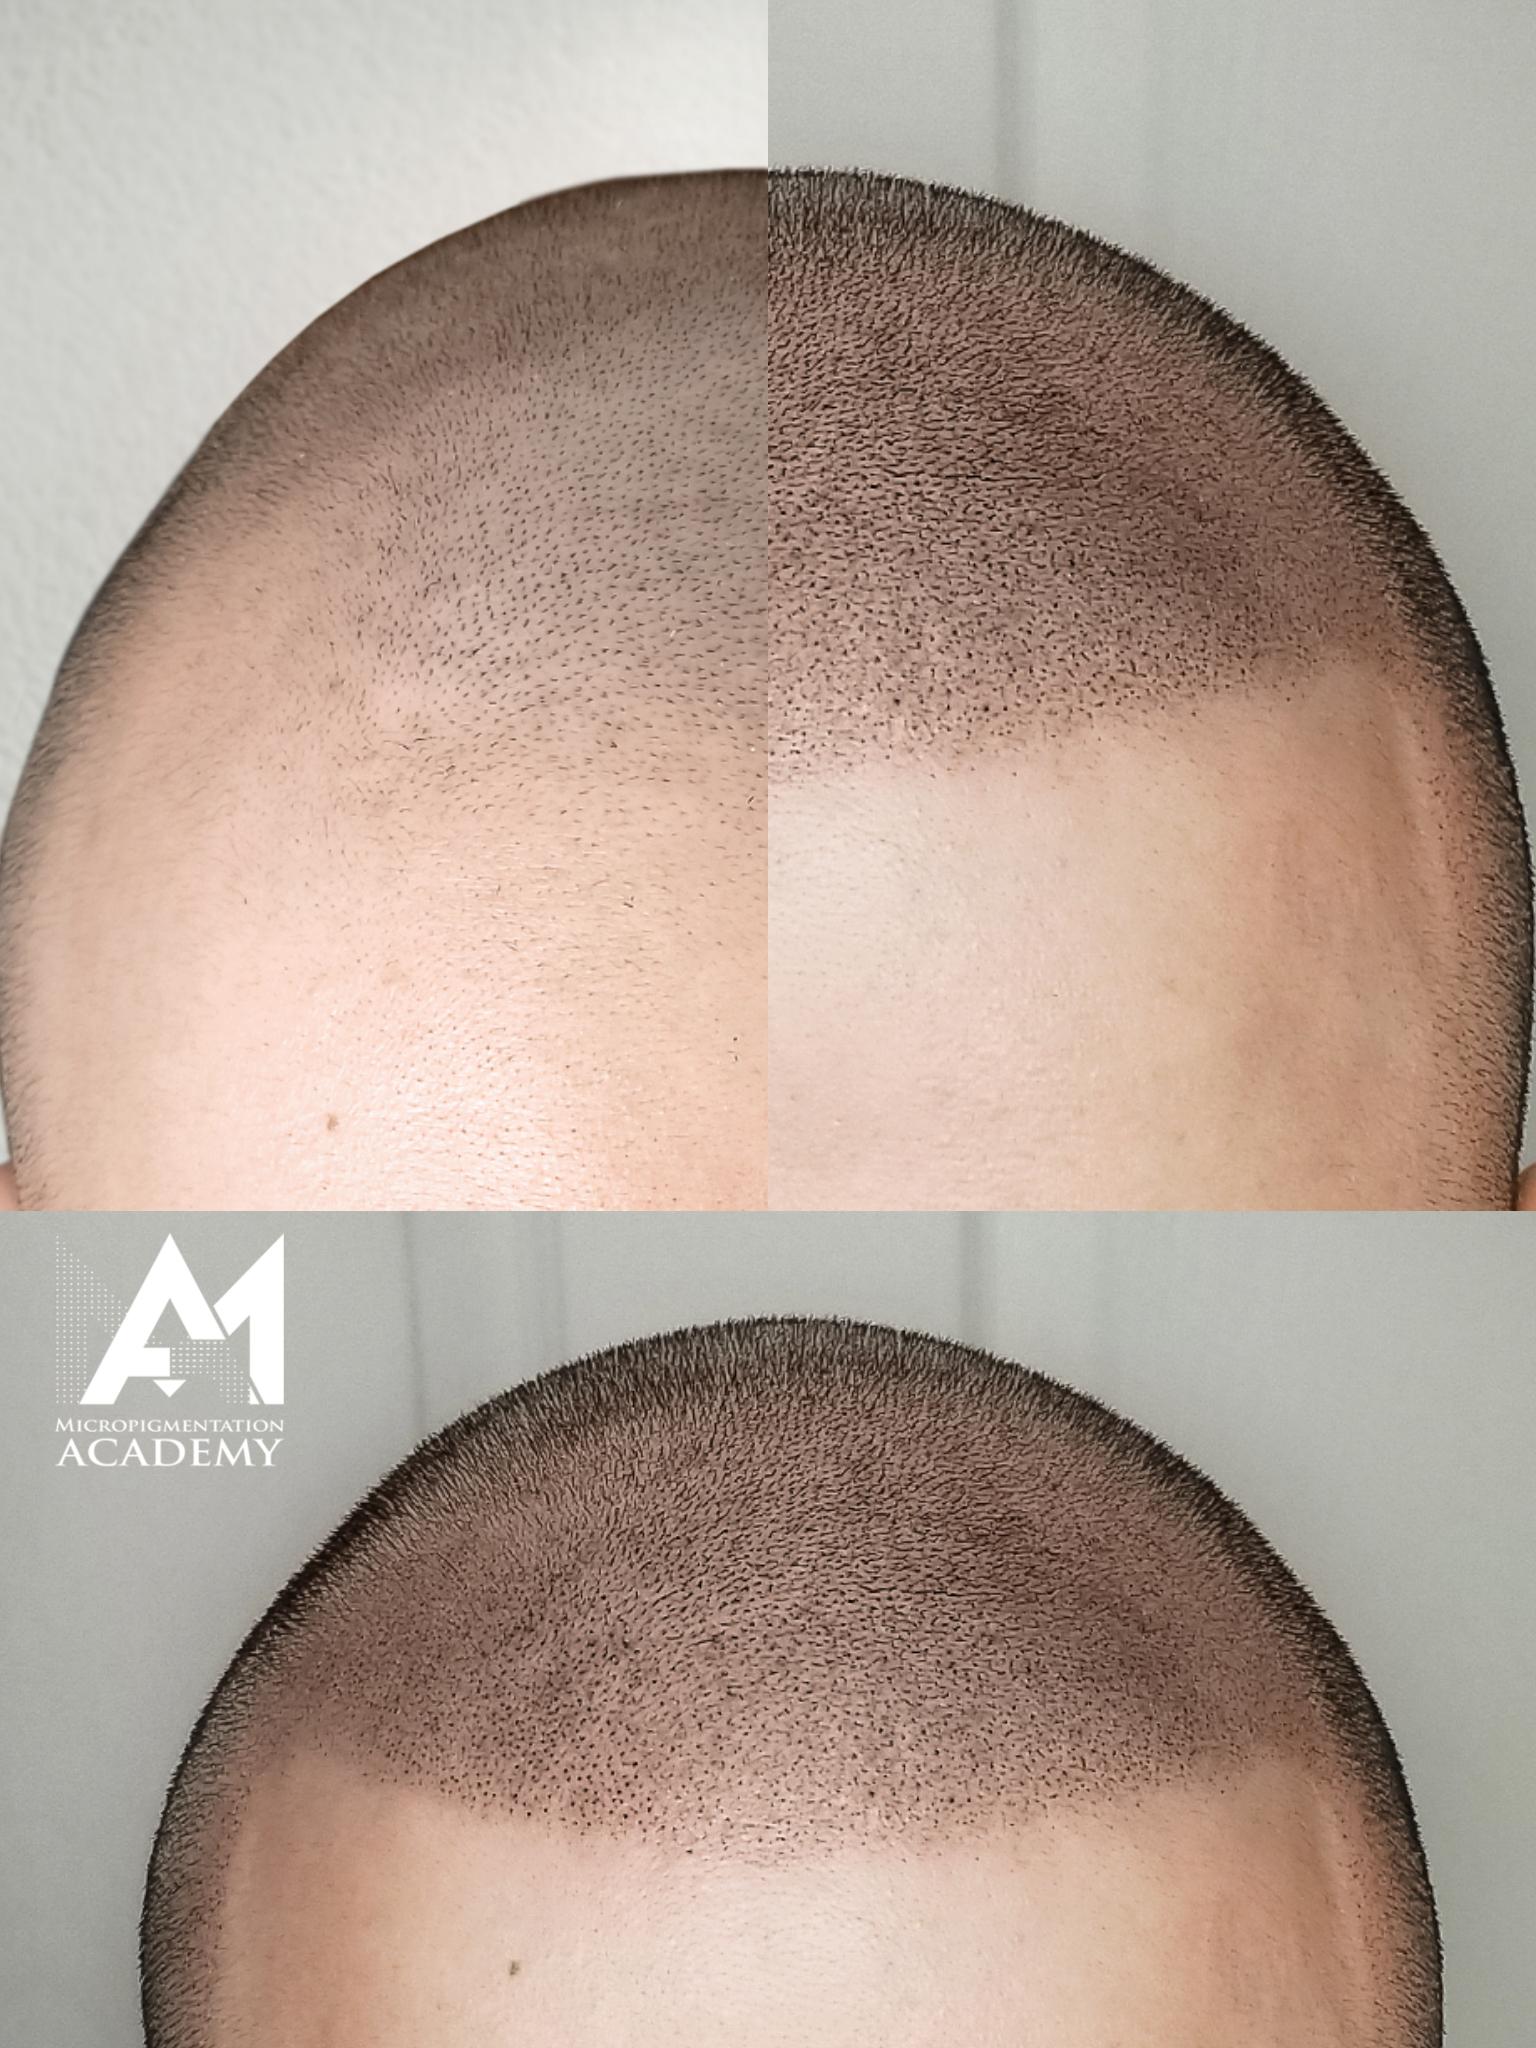 Micropigmentation Academy (Microblading- Scalp Tattoo Treatment/Training) Connecticut image 2